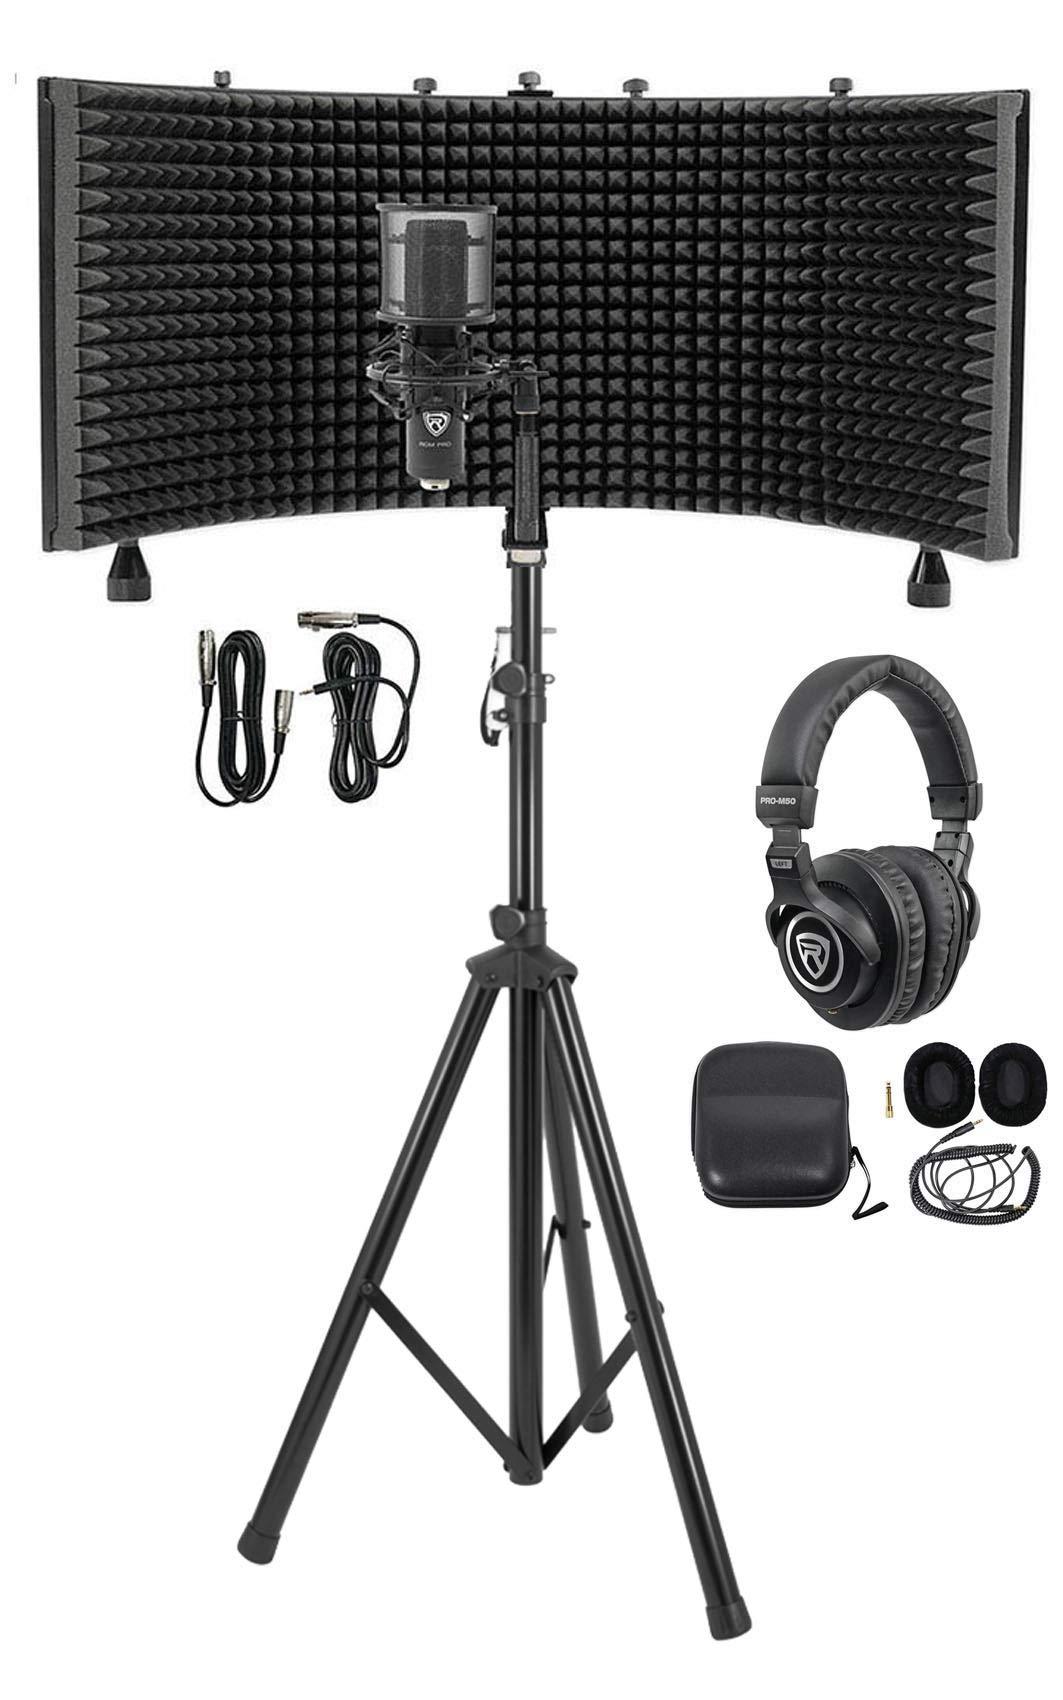 Rockville Pro Recording Studio Microphone Mic+Isolation Shield+Headphones+Stand